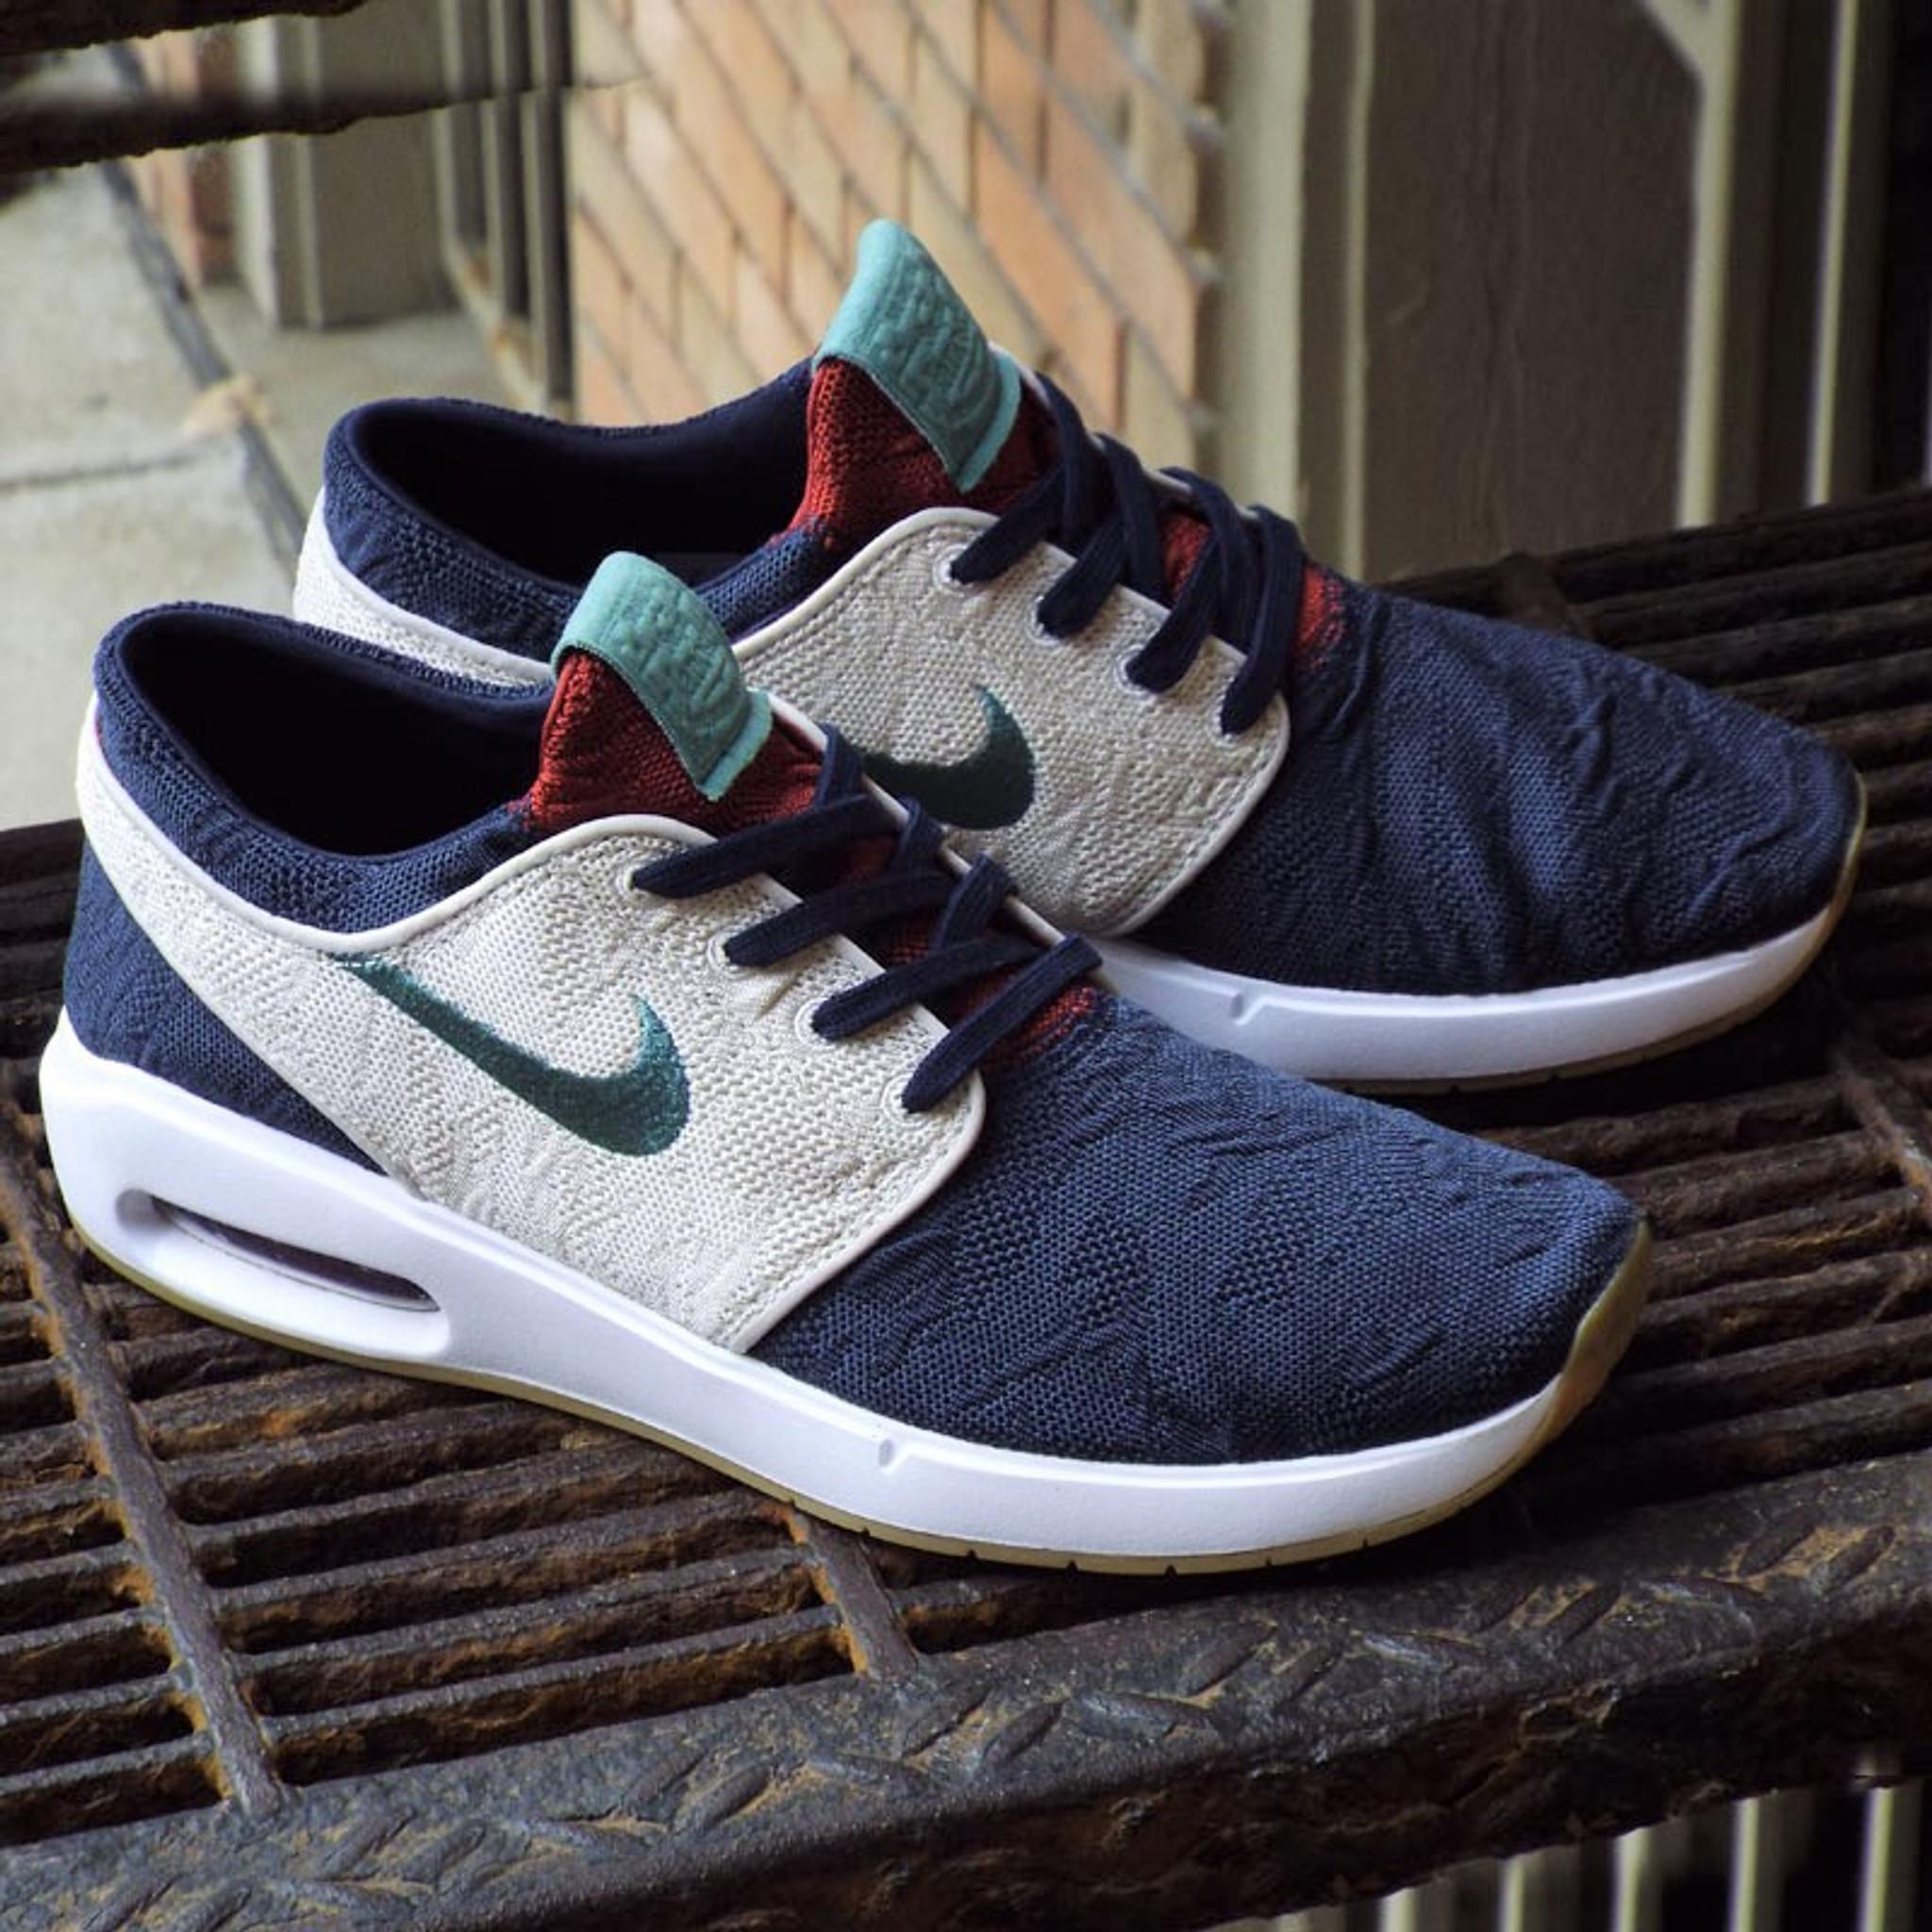 Posicionar cascada Una noche  Nike SB Air Max Janoski 2 Shoes - Obsidian/Bicoastal-Desert Sand - Detroit  City Skateboards Co.